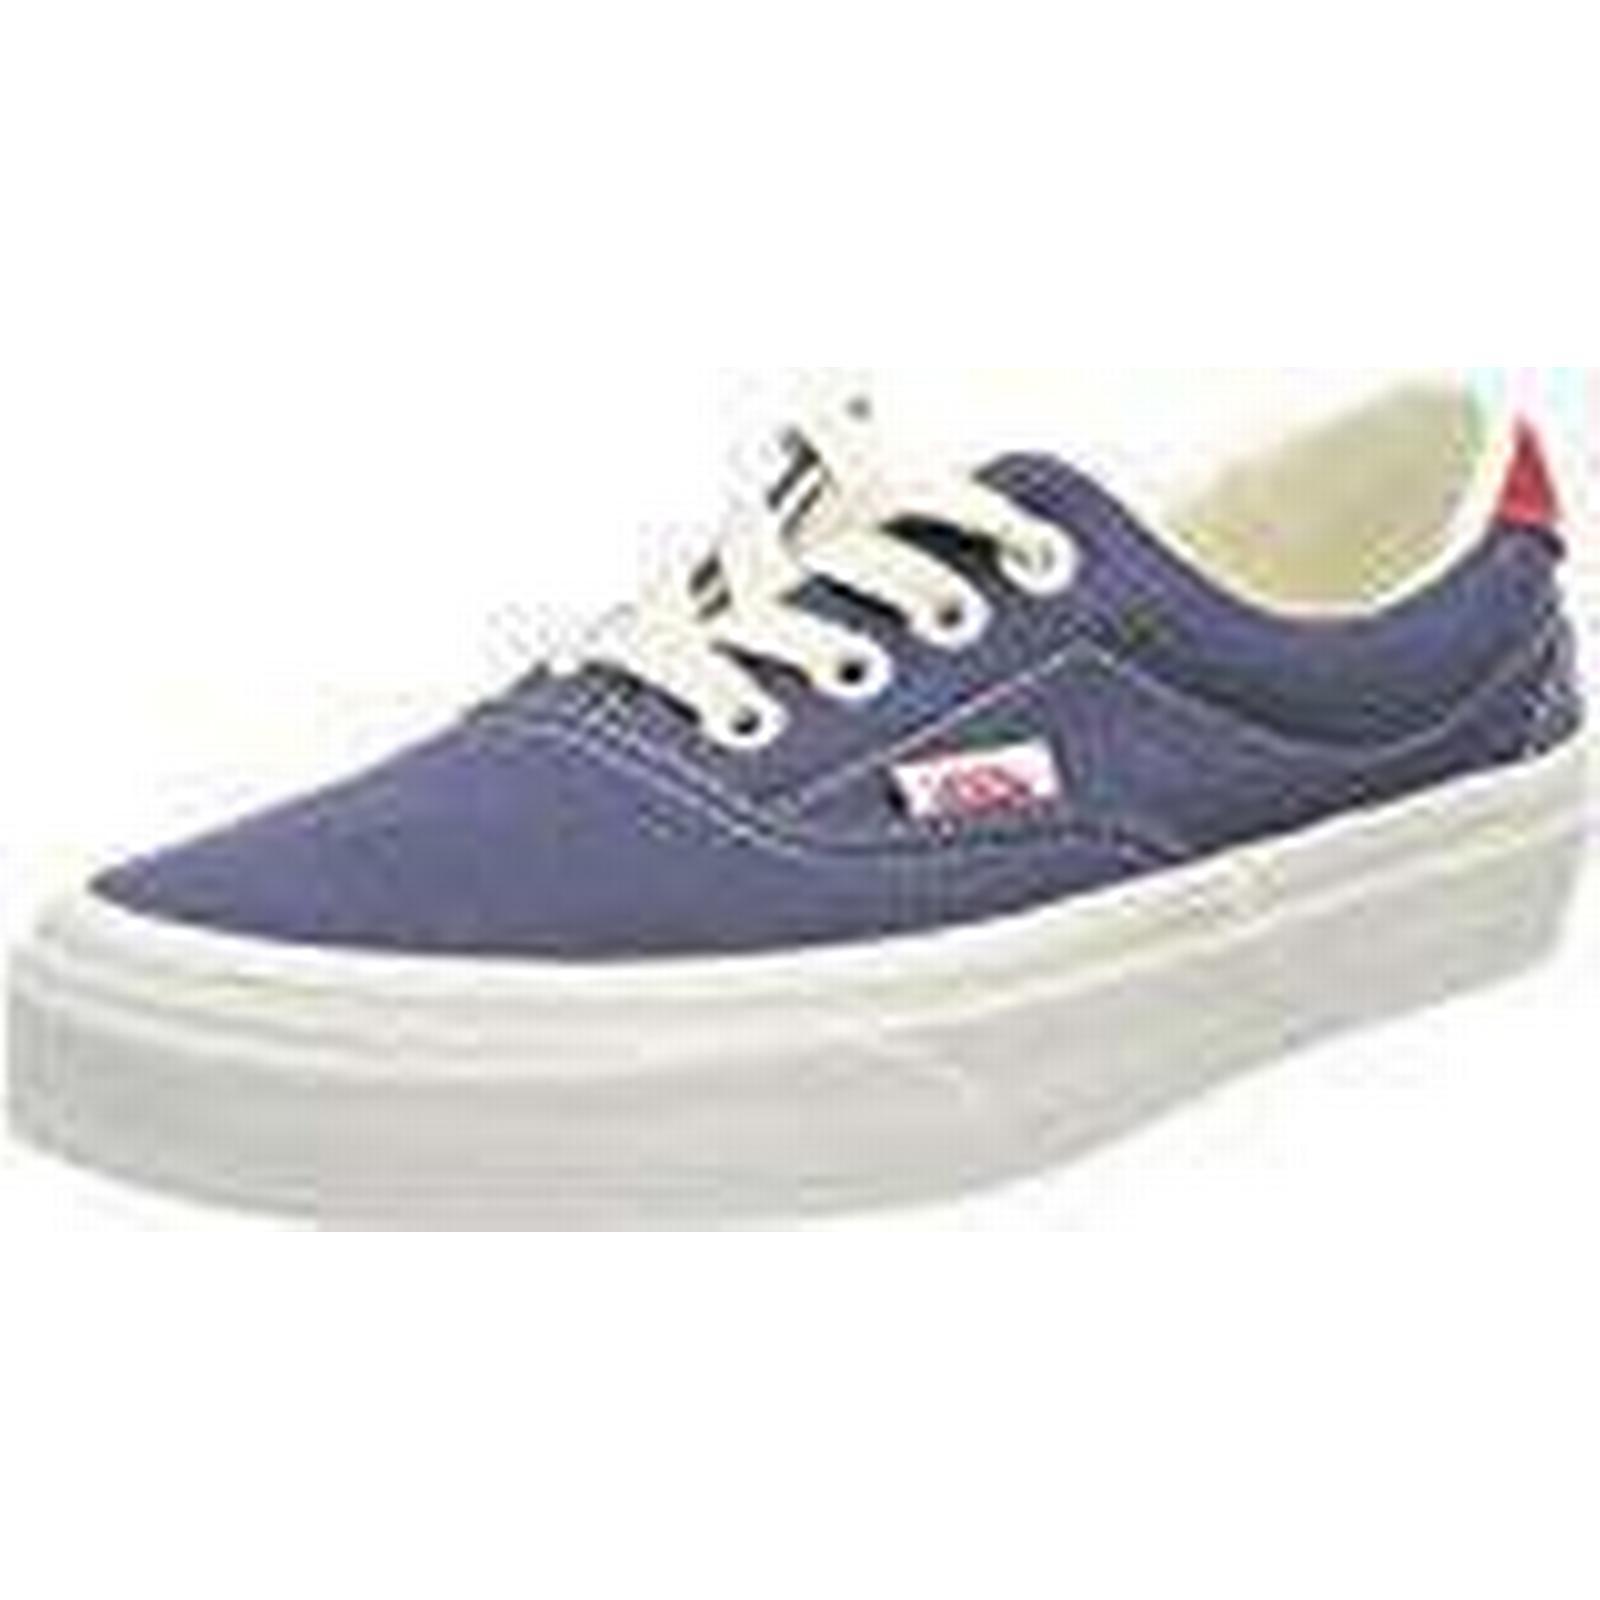 Vans Unisex Adults' (Vintage Era 59 Trainers, Blue (Vintage Adults' Indigo/Rococco Red Qkj), 3 UK 35 EU e4a2b7